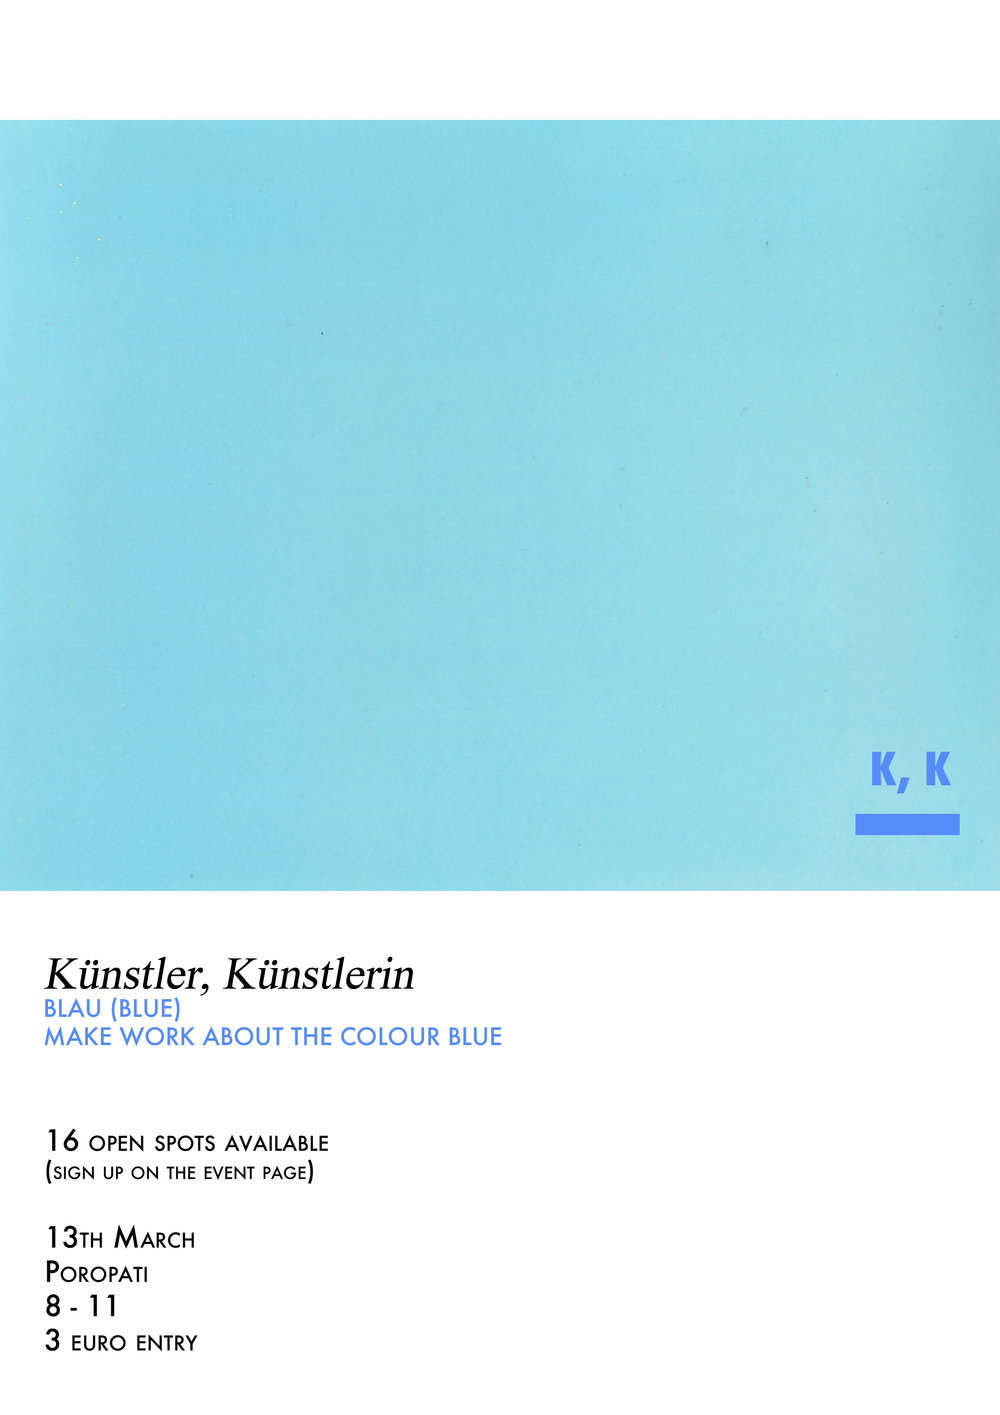 Künstler, Künstlerin, Blau (Blue) make work about the colour blue.jpg